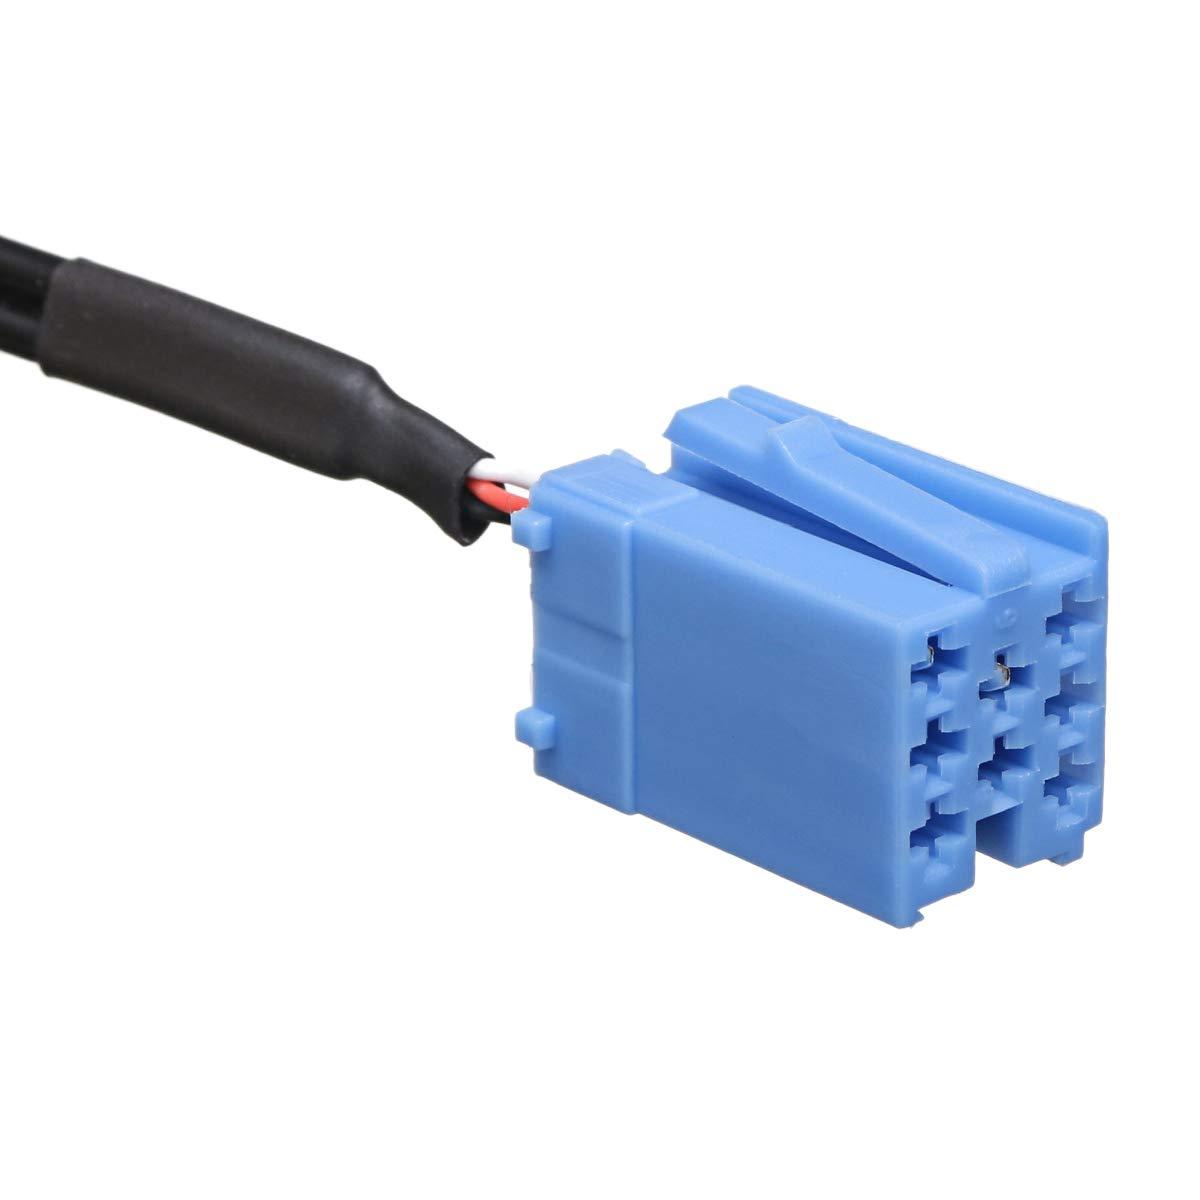 Tiamu Adaptador de M/úSica Auxiliar Blue-Tooth Interfaz Radio Inal/áMbrica Est/éReo Cable Auxiliar para Alfa Romeo 147156159 Brera Mito GT Giulietta